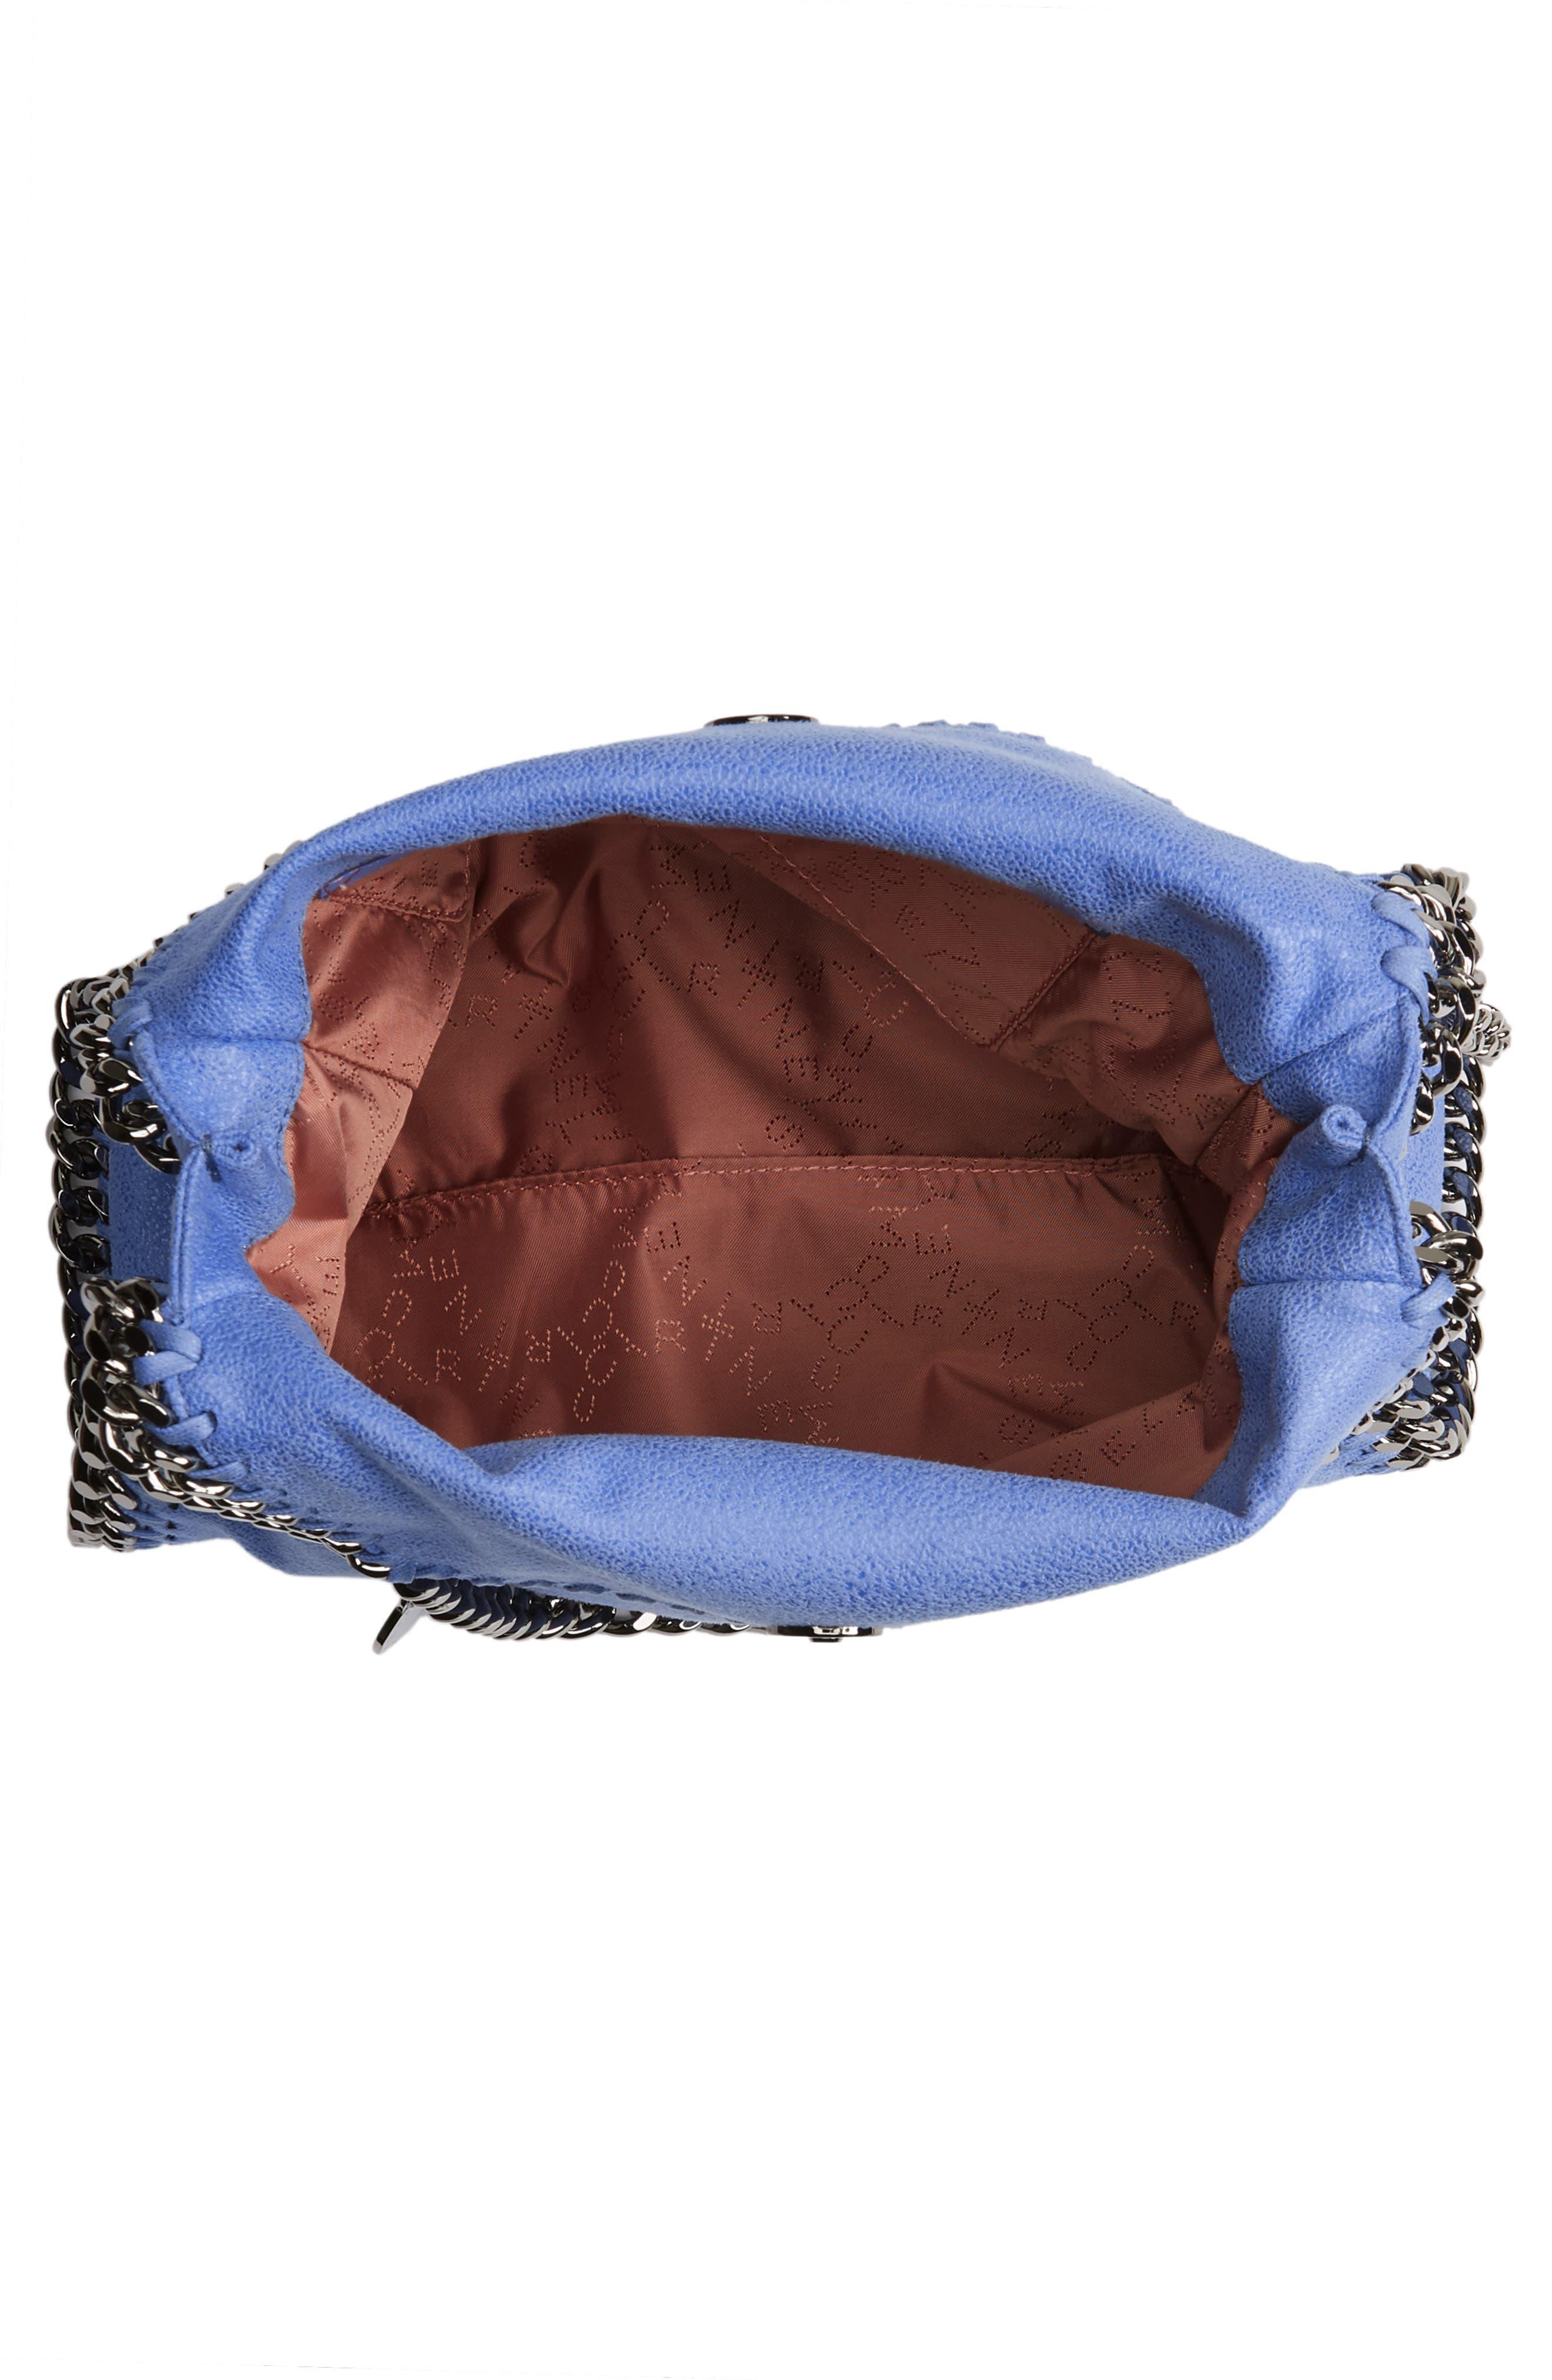 STELLA MCCARTNEY, 'Mini Falabella - Shaggy Deer' Faux Leather Tote, Alternate thumbnail 4, color, CERULEAN